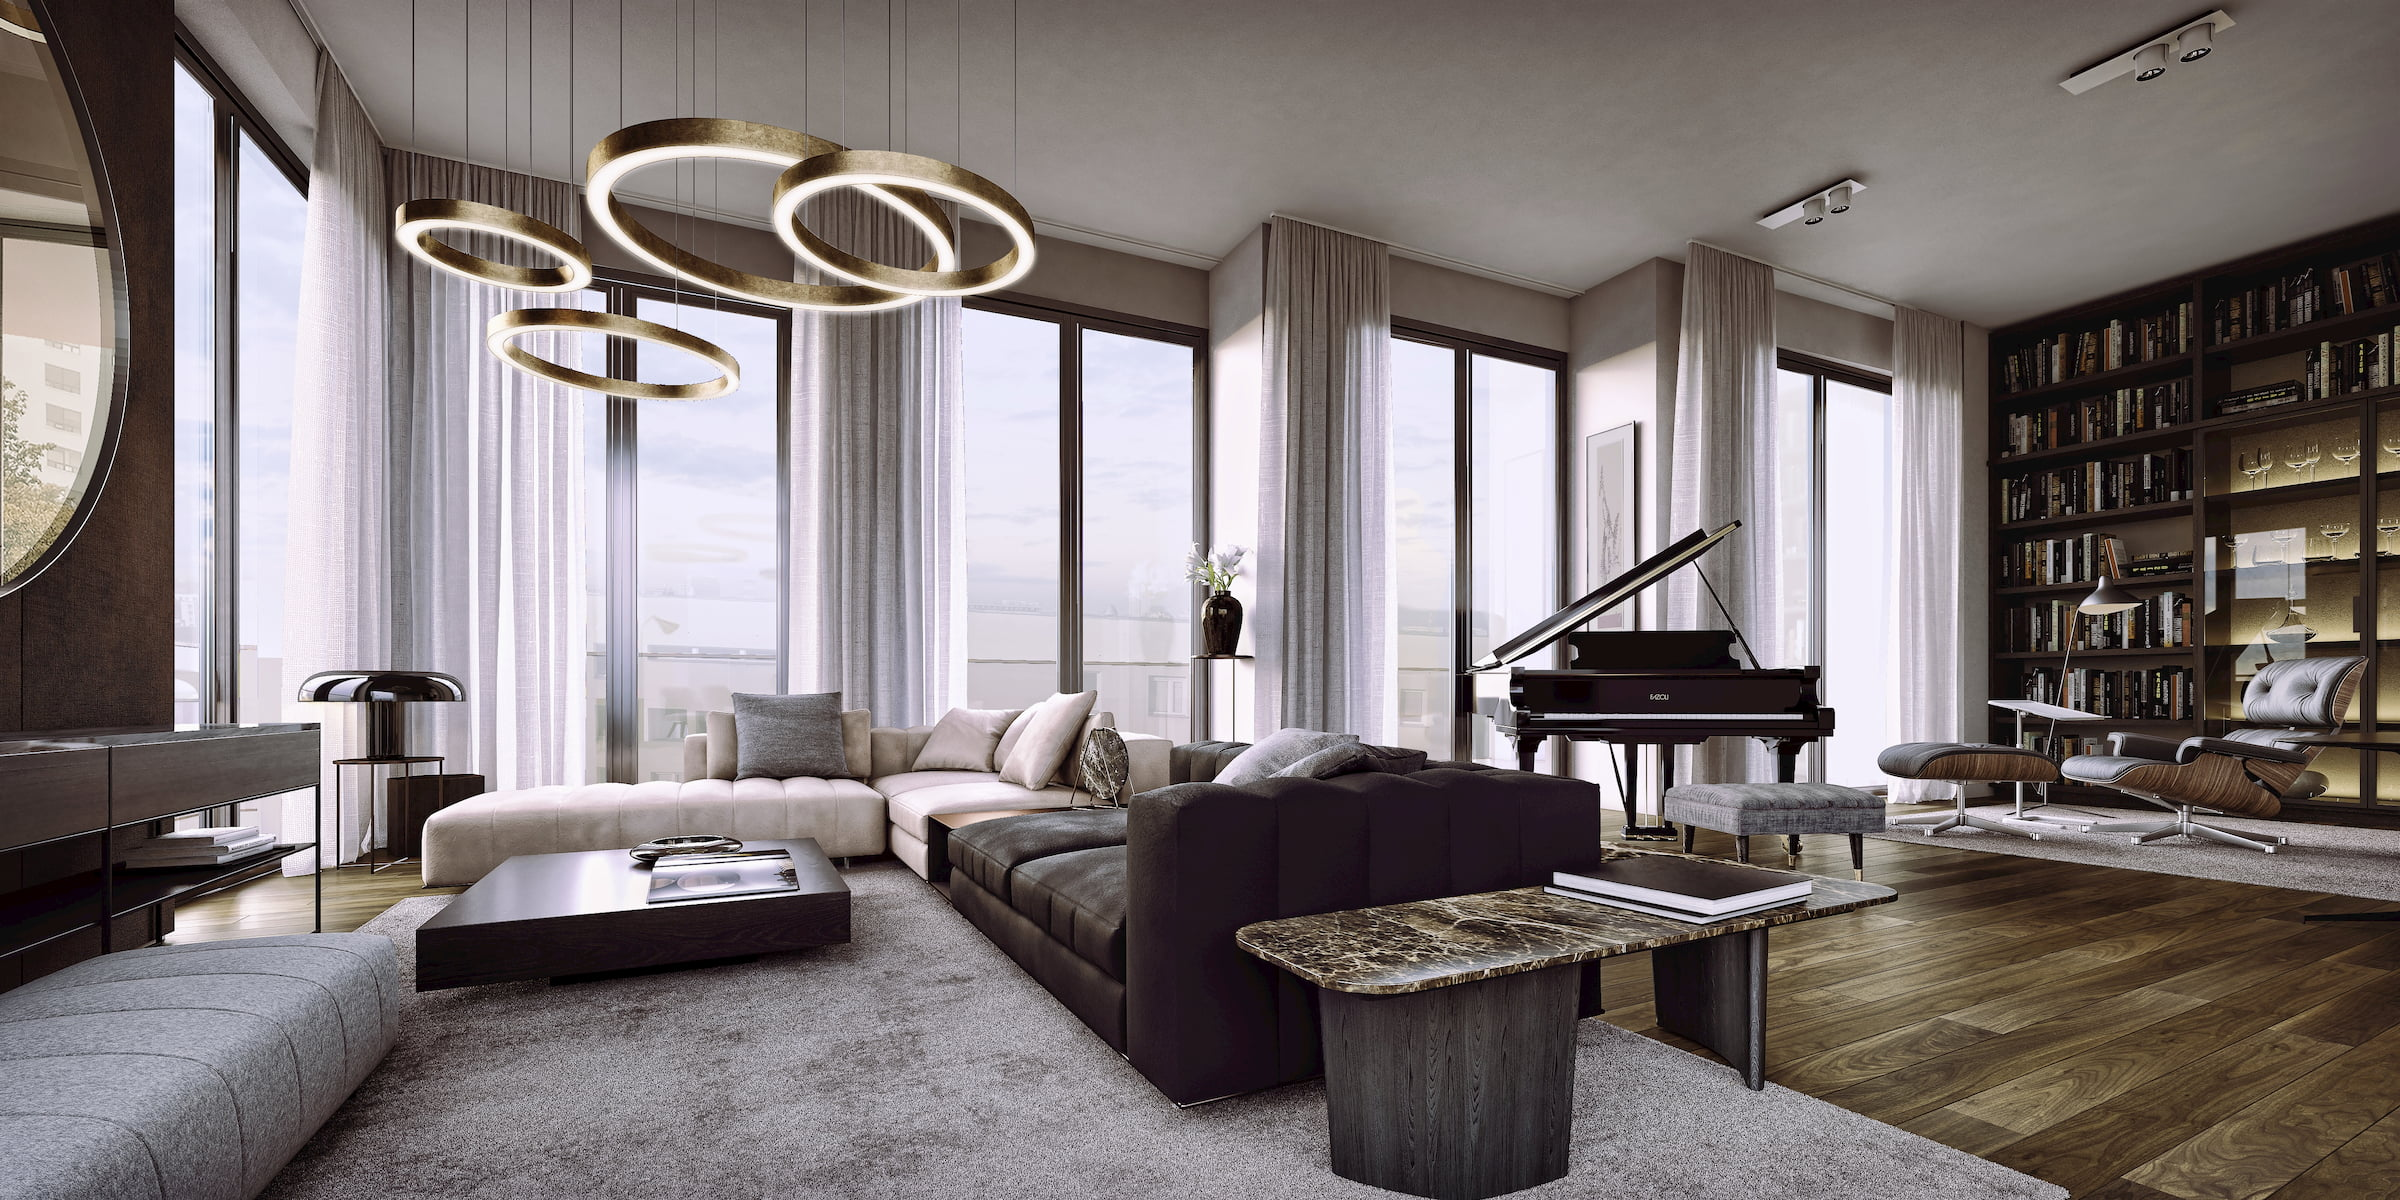 Luxurious interior Private investor Dembowska/Jagiello 2018